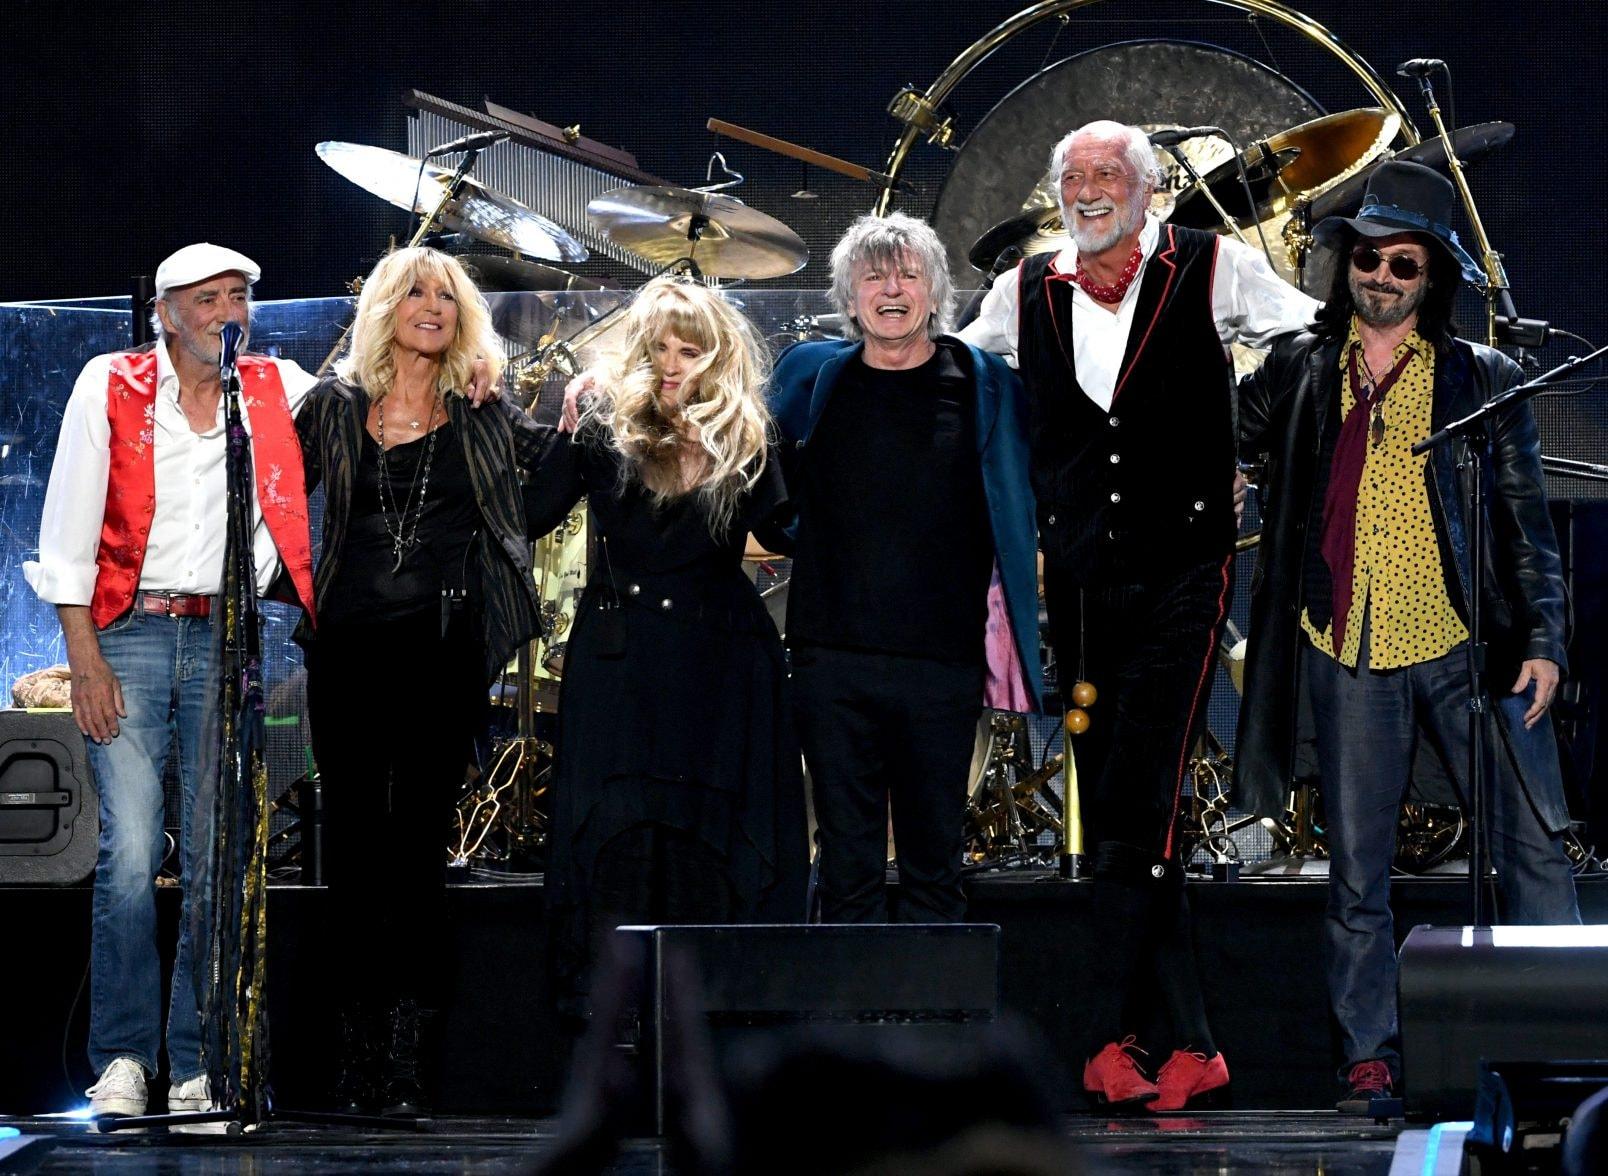 Fleetwood Mac Concert In New Zealand Sees 17 People Kicked